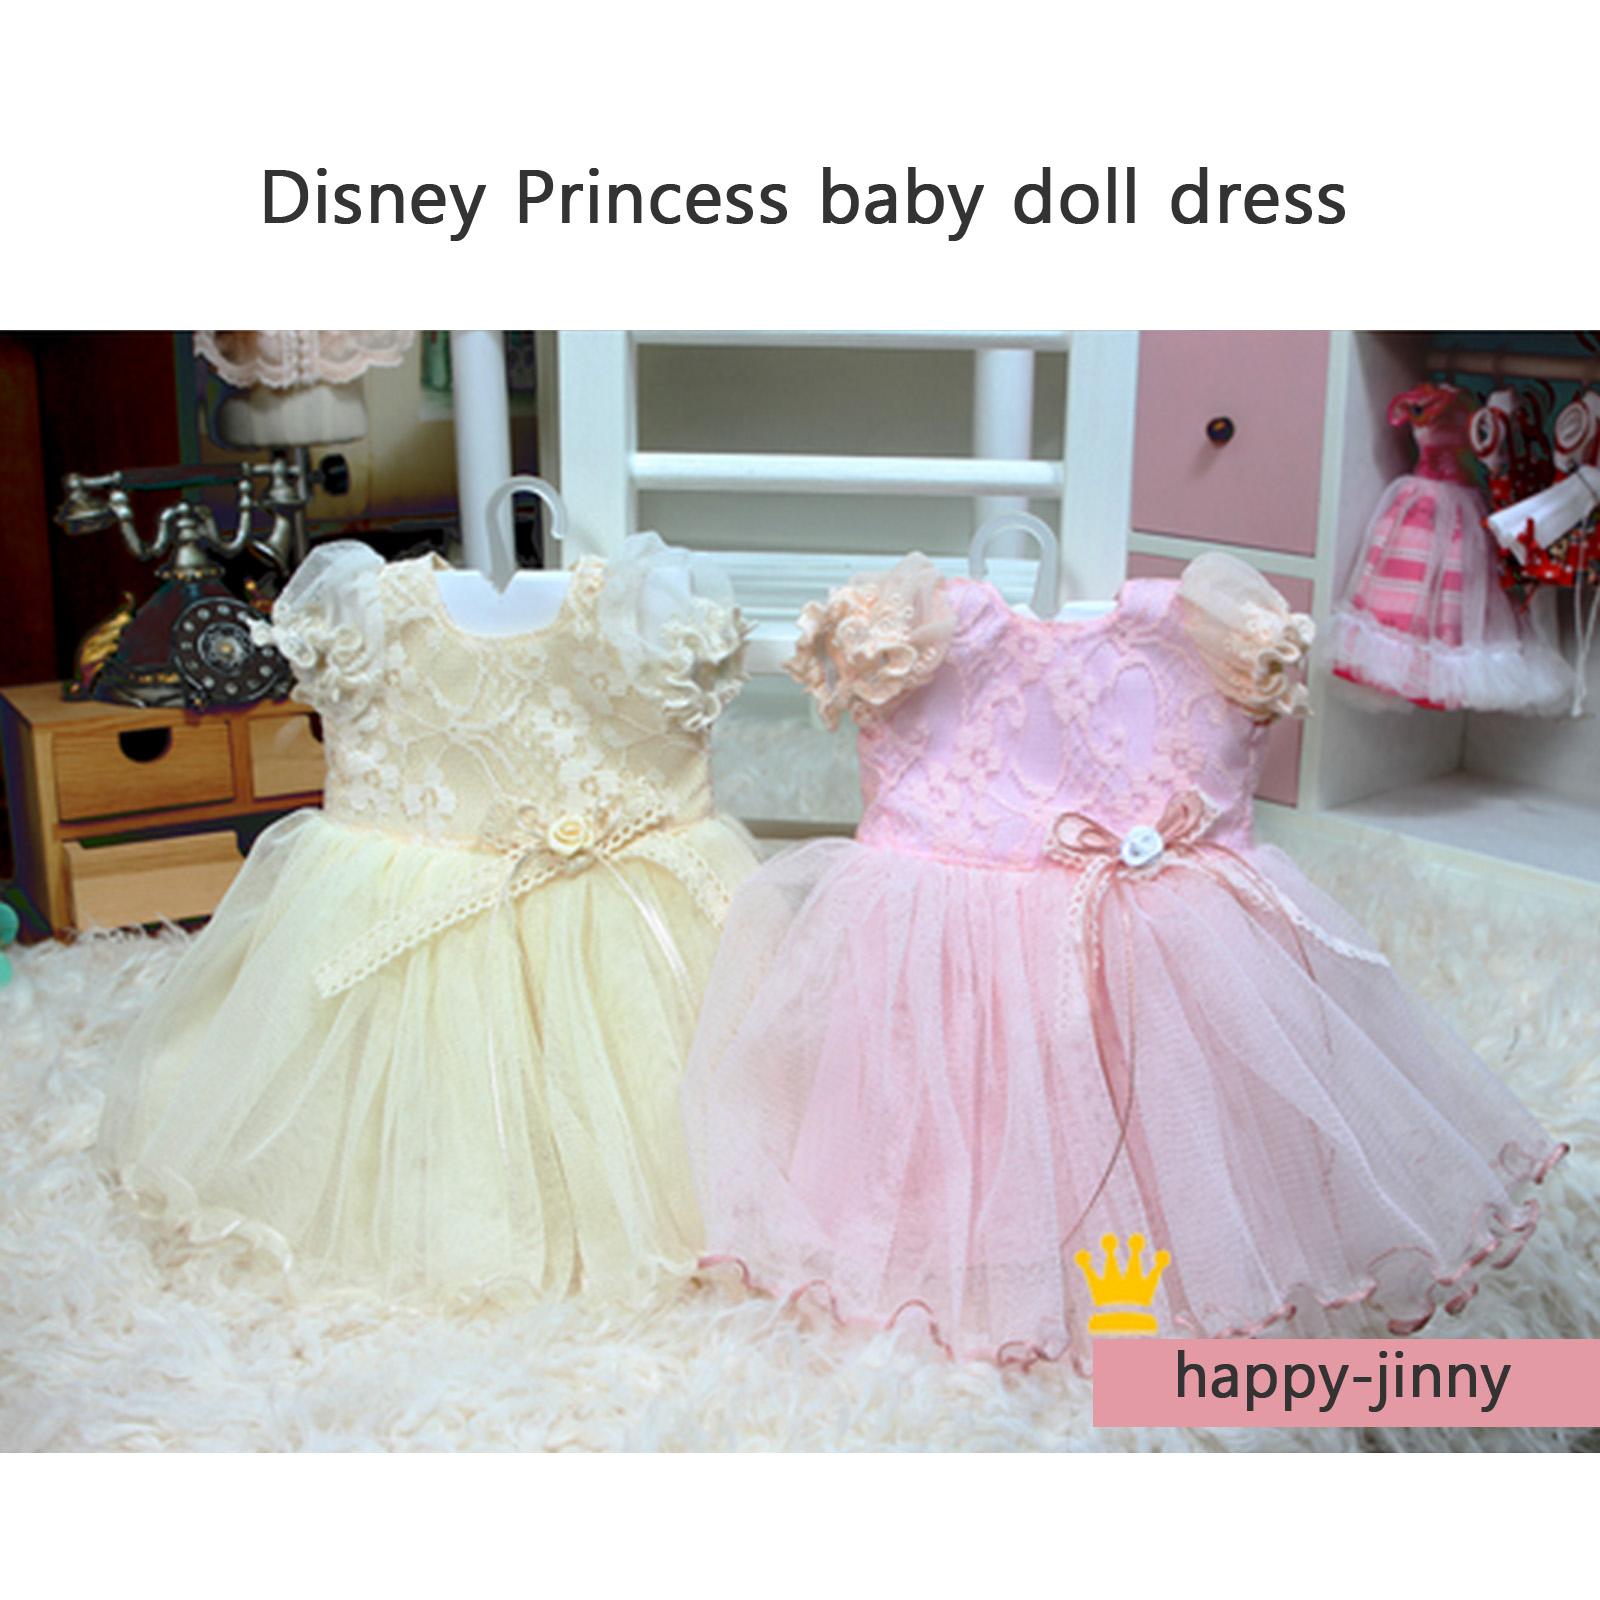 Disney Princess Doll Clothes: Disney Baby Doll Clothes Dress Clothing Animator's